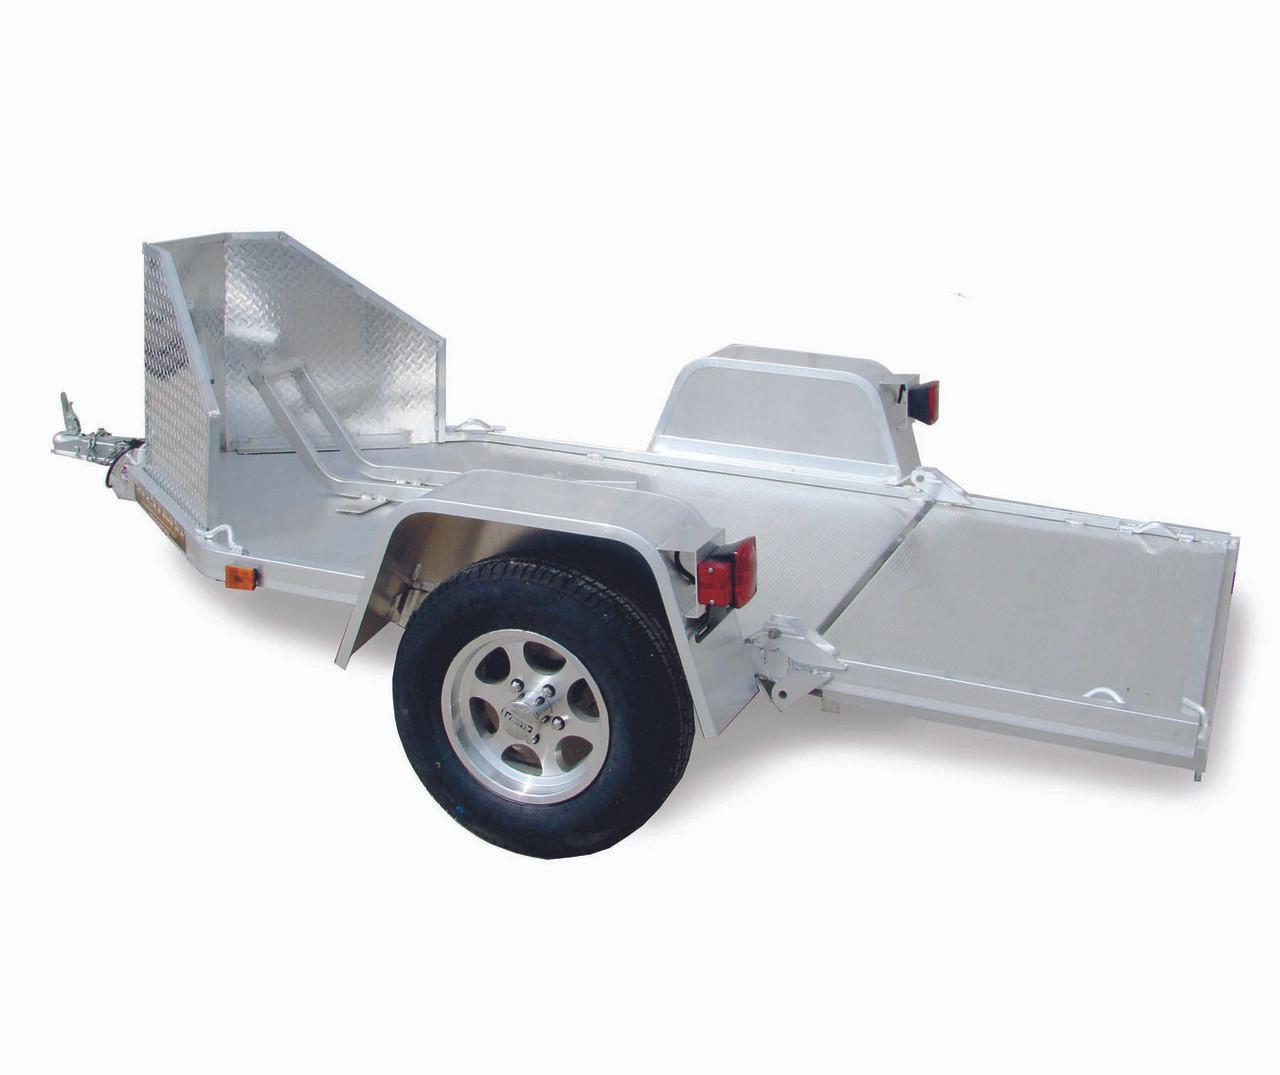 Almc1f 51 X 106 Aluminum Motorcycle Trailer With Folding Bed Aluma Wiring Diagram